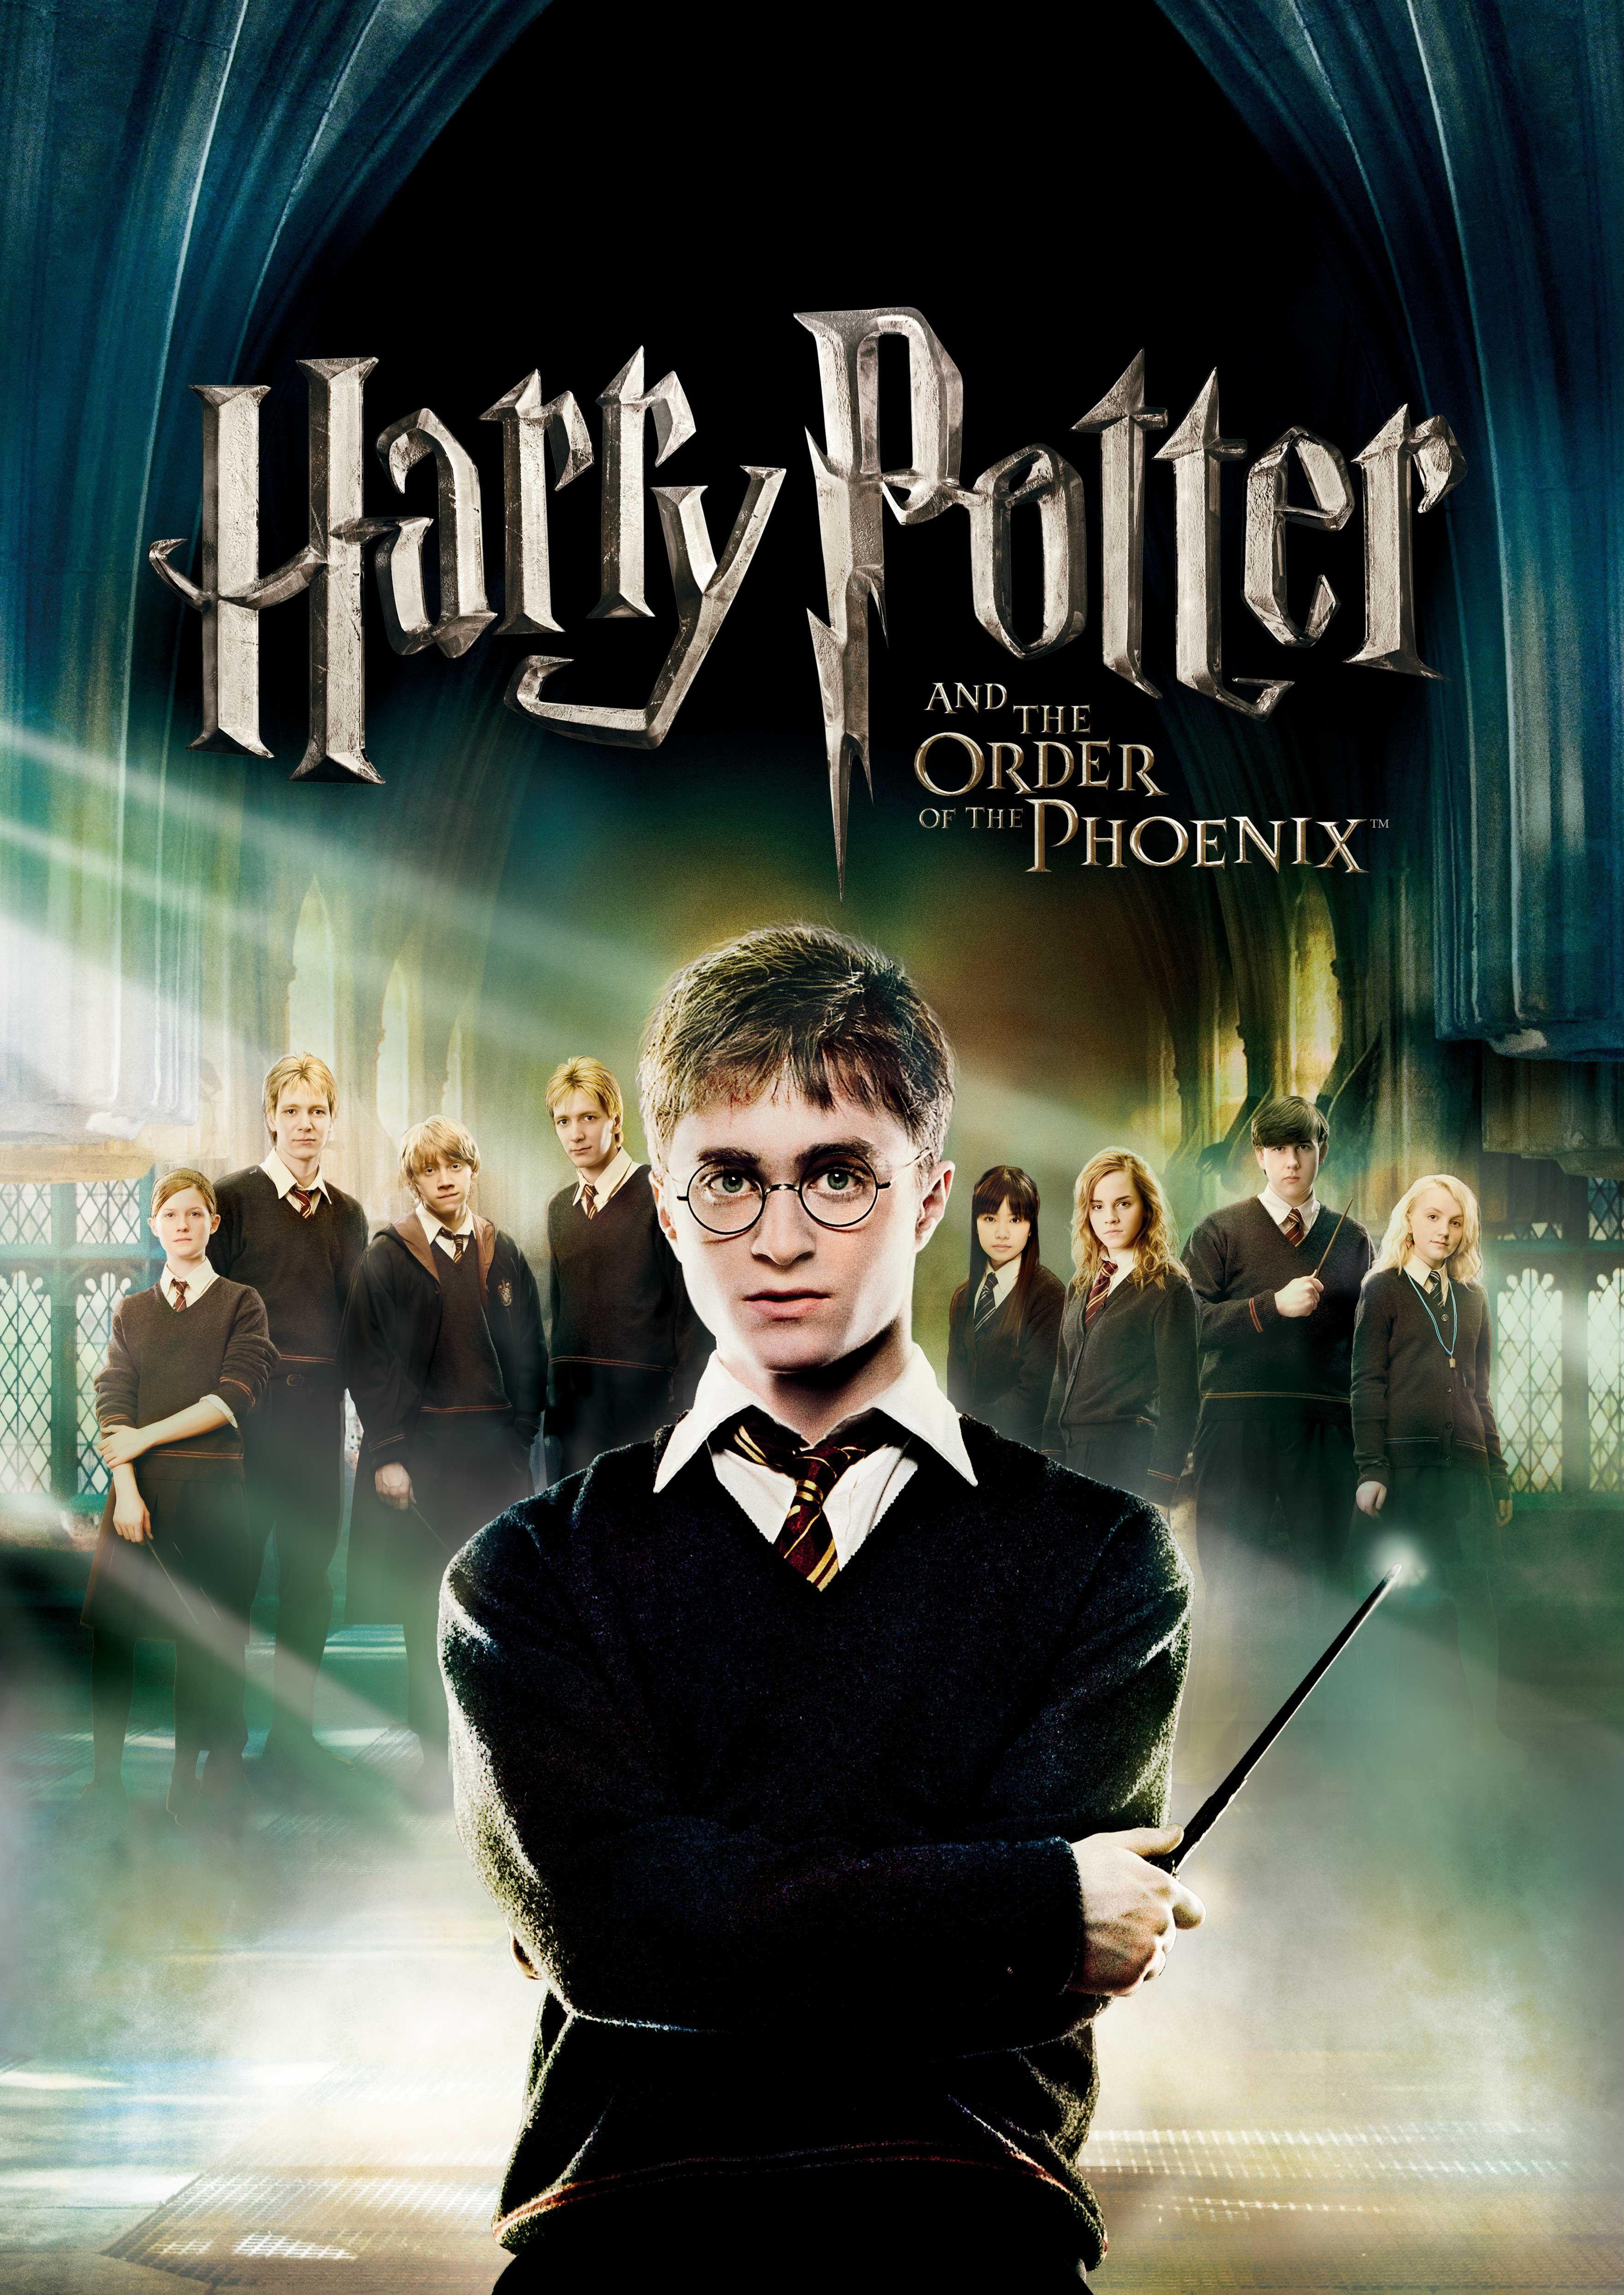 Harry Potter And The Order Of The Phoenix 2007 Harry Potter I Zakon Feniksa Harry Potter Video Games Harry Potter Order Harry Potter Gif